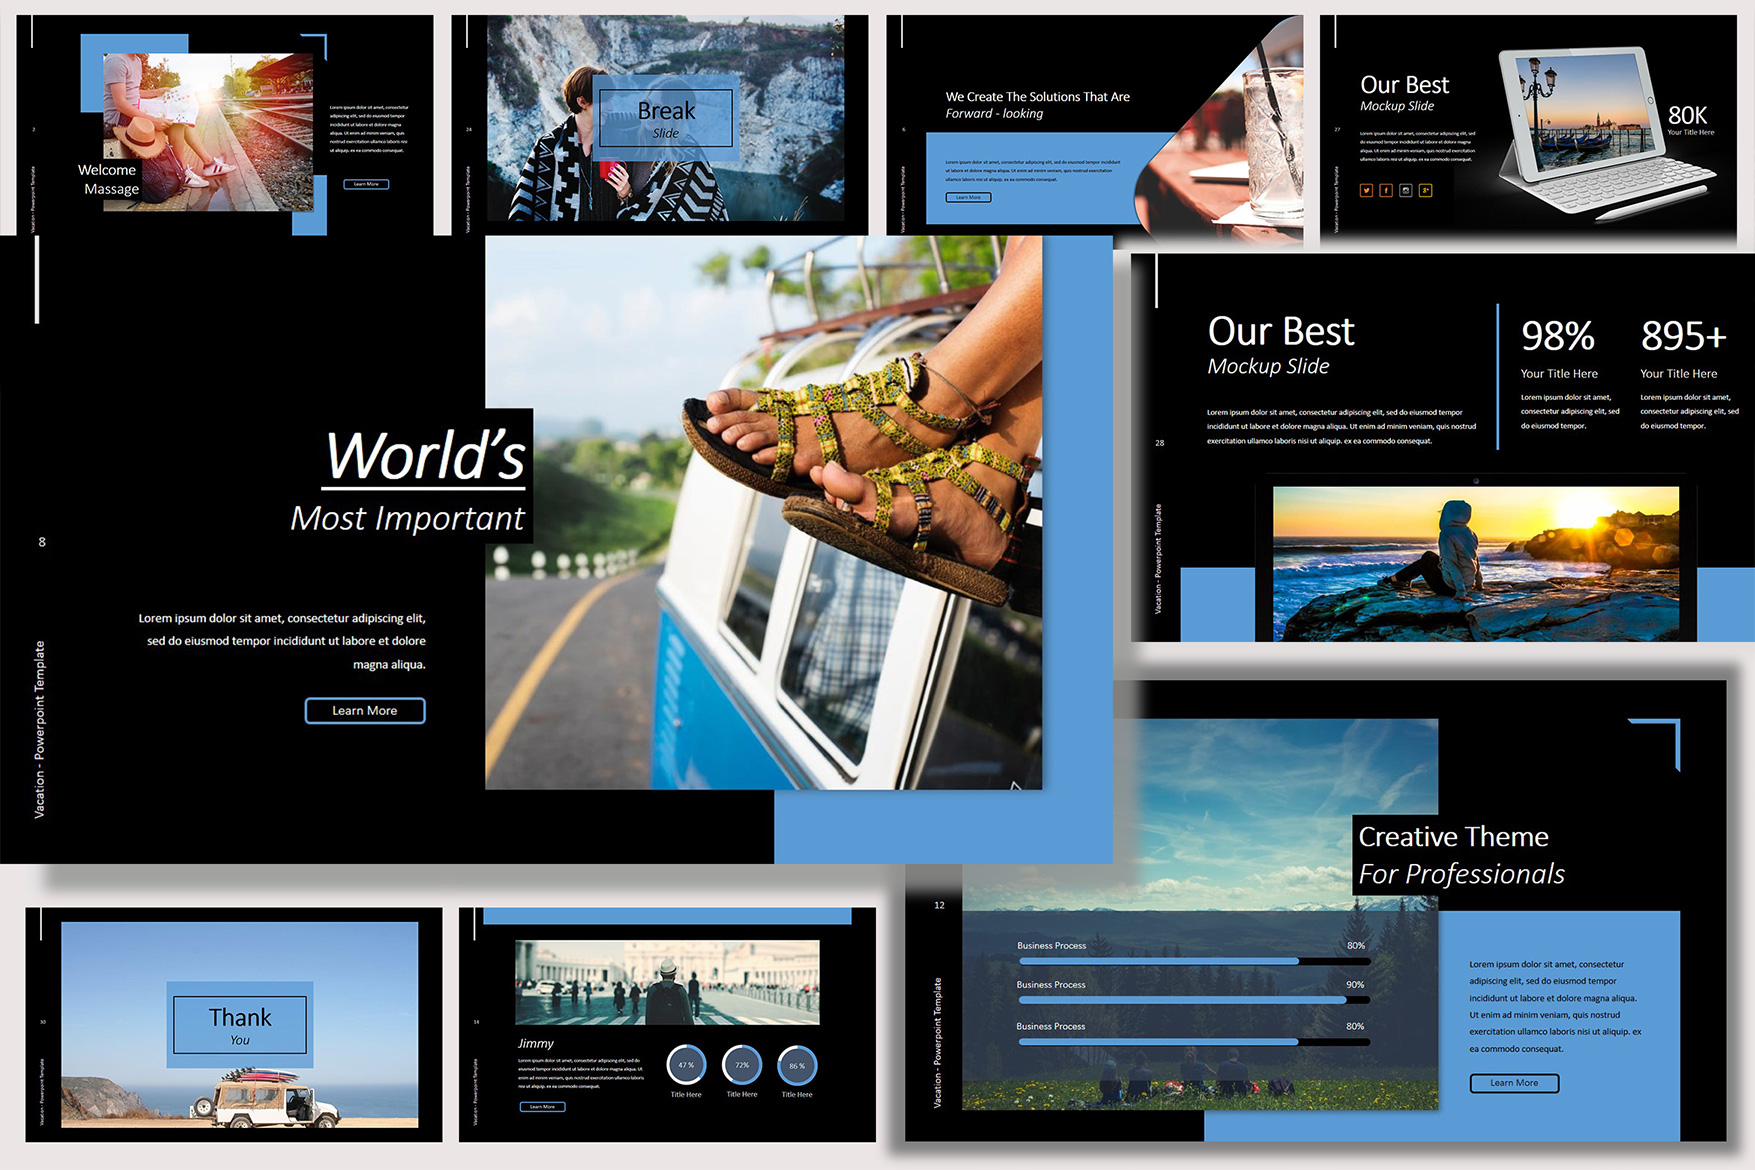 Vacation Lookbook Dark Powerpoint Template example image 2